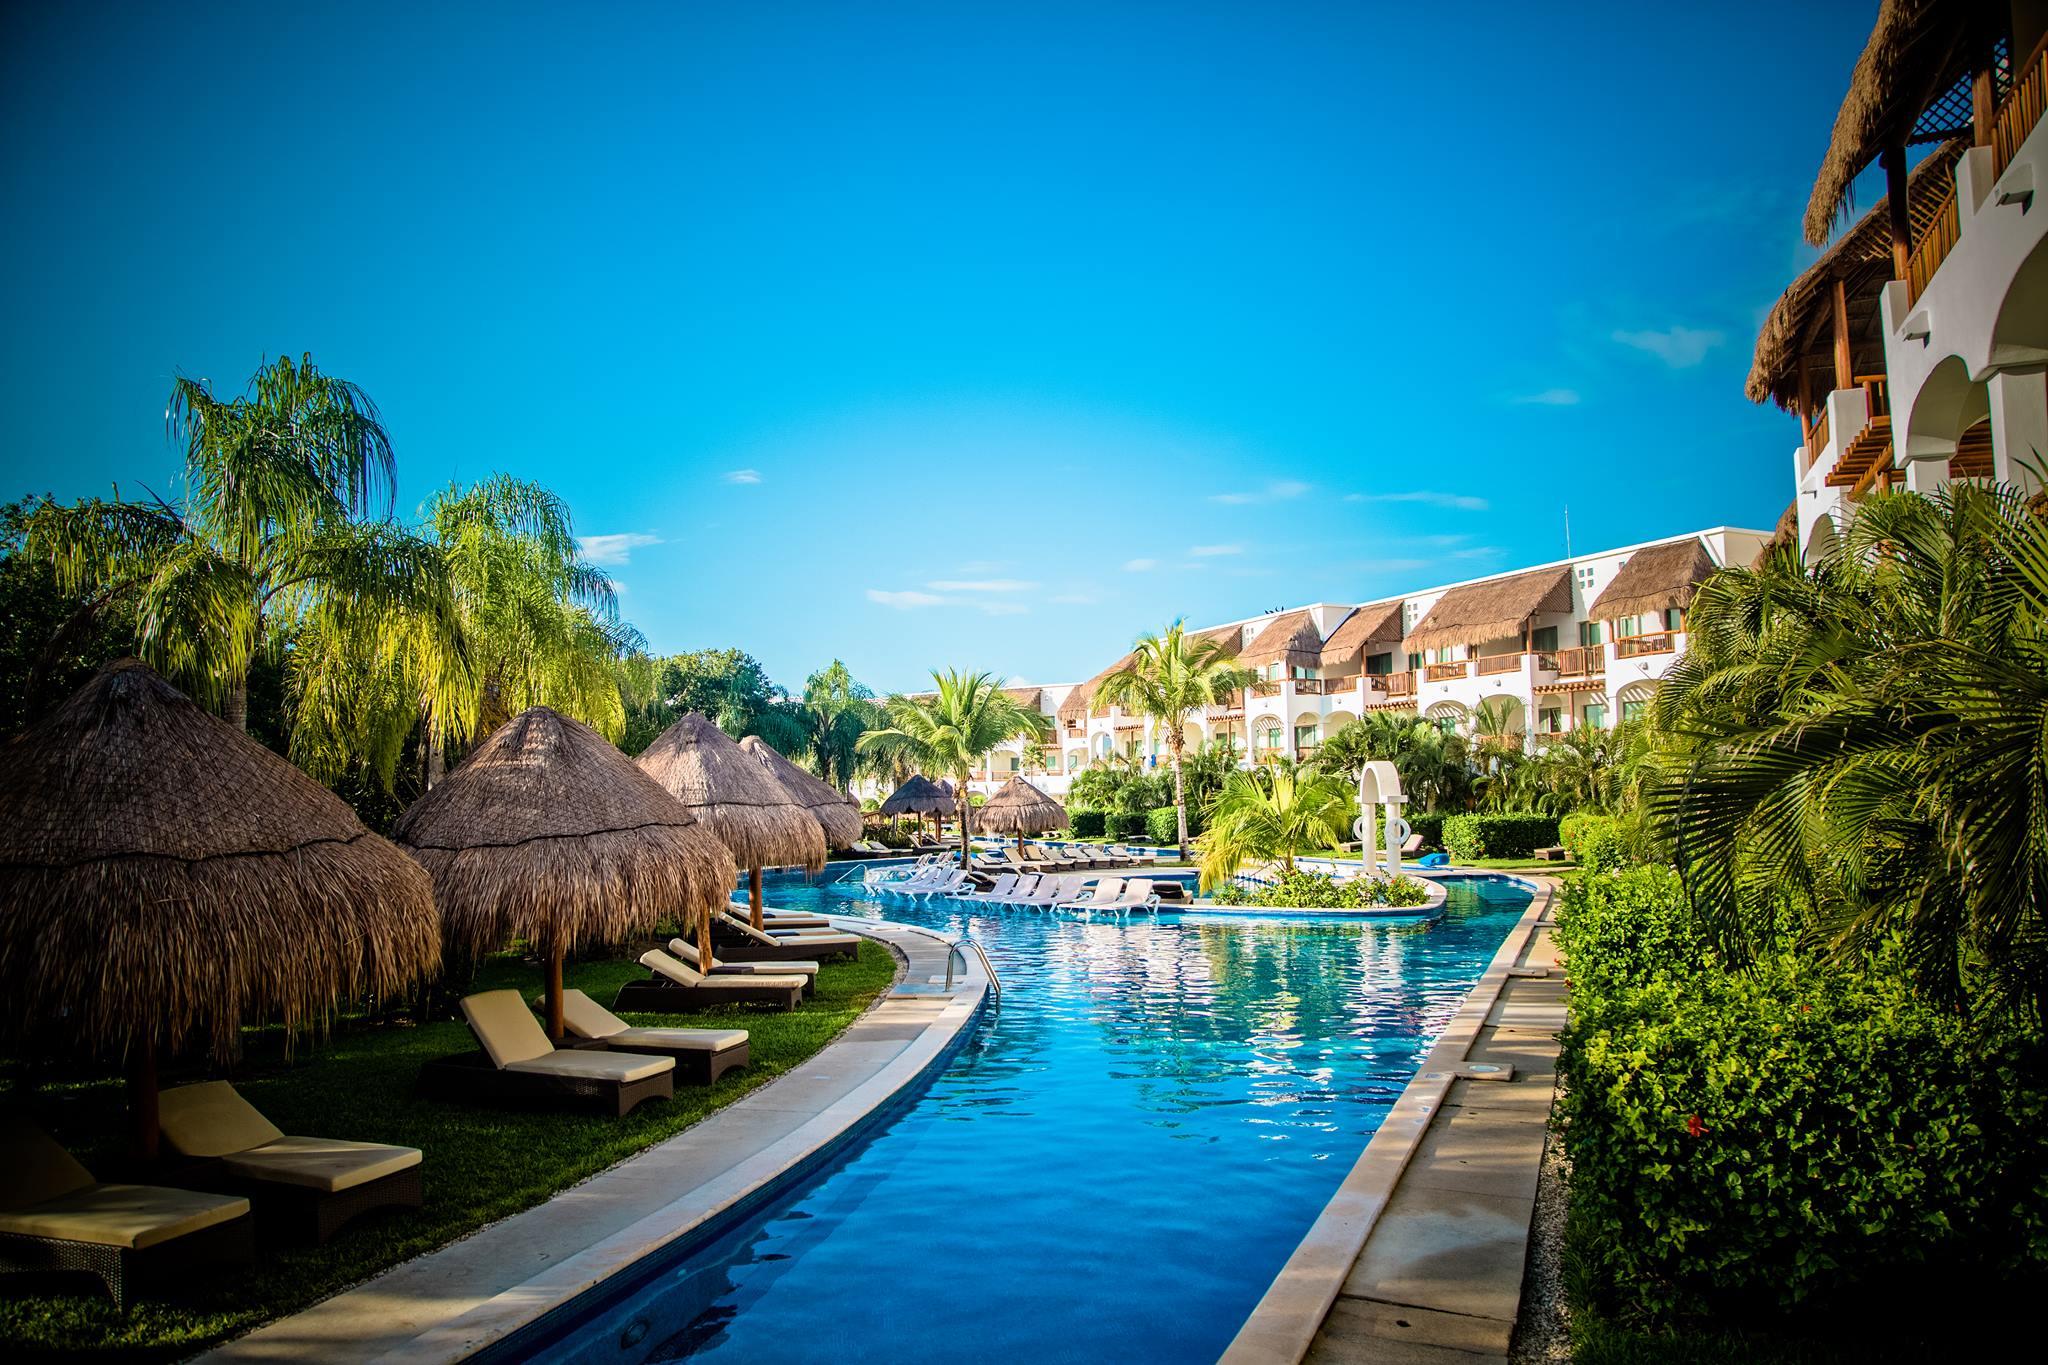 Riviera Maya Resort Sophistication At Its Finest All